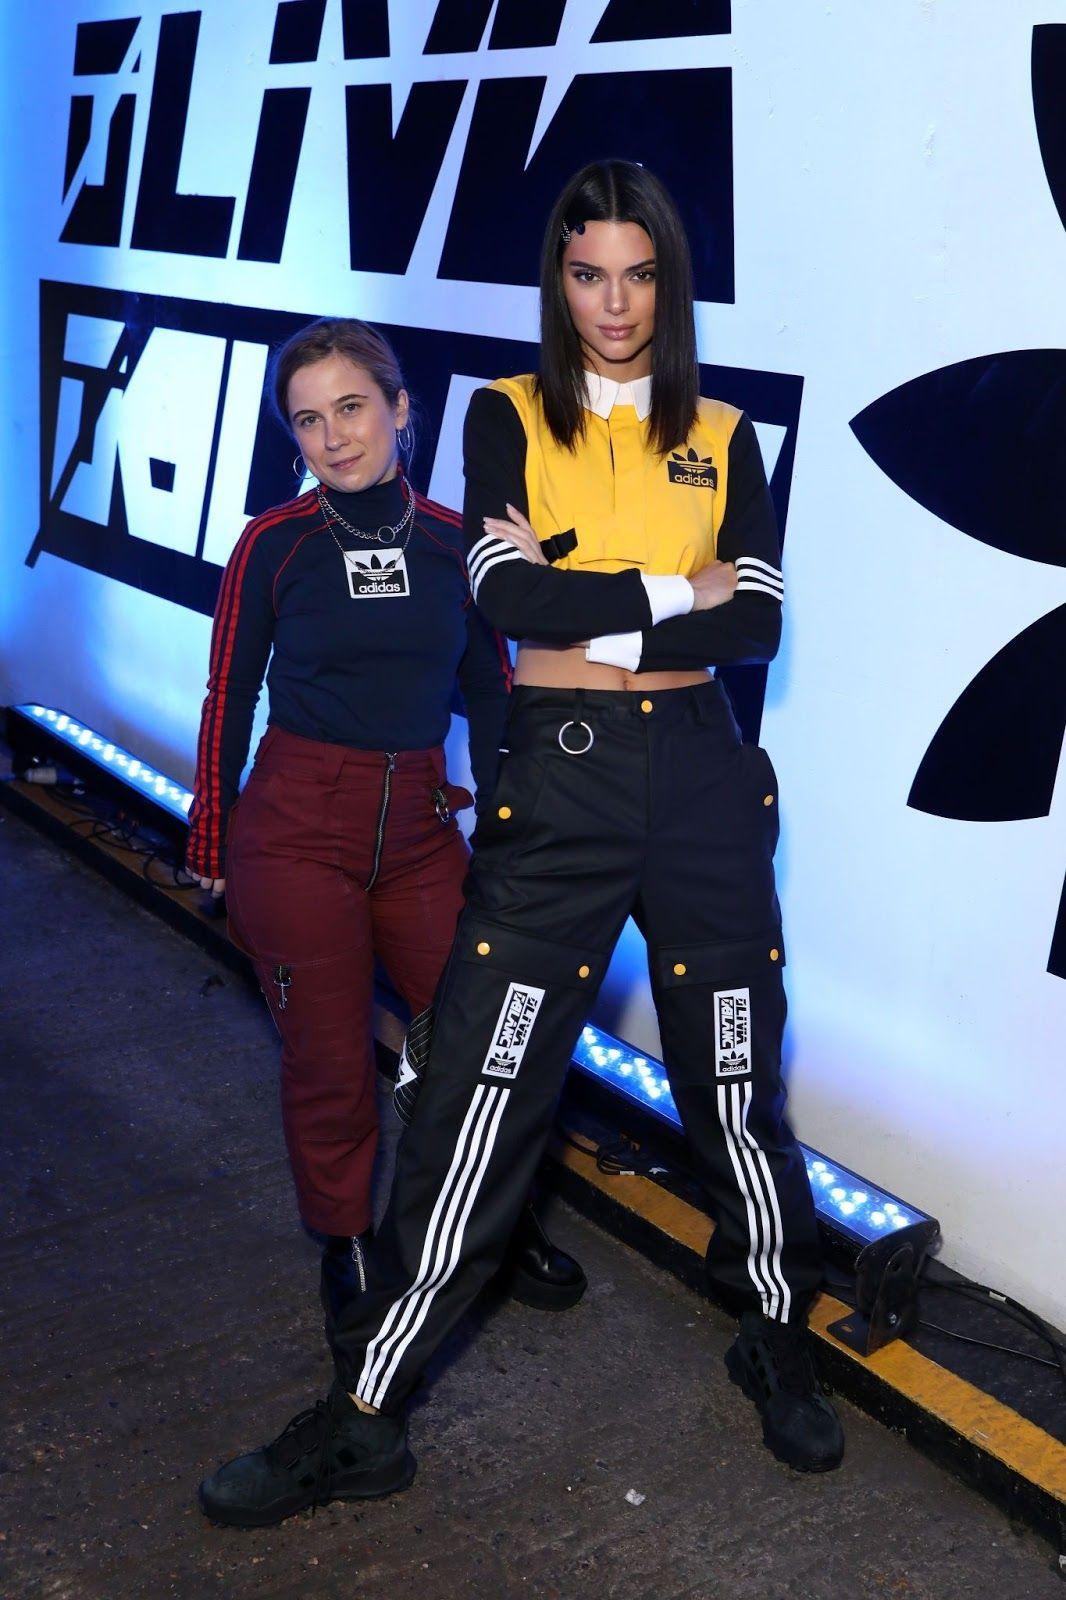 buy online 97437 8c4af Kendall Jenner - Adidas Originals presention by Olivia Oblanc in London  11 15 18 – Celeb Central